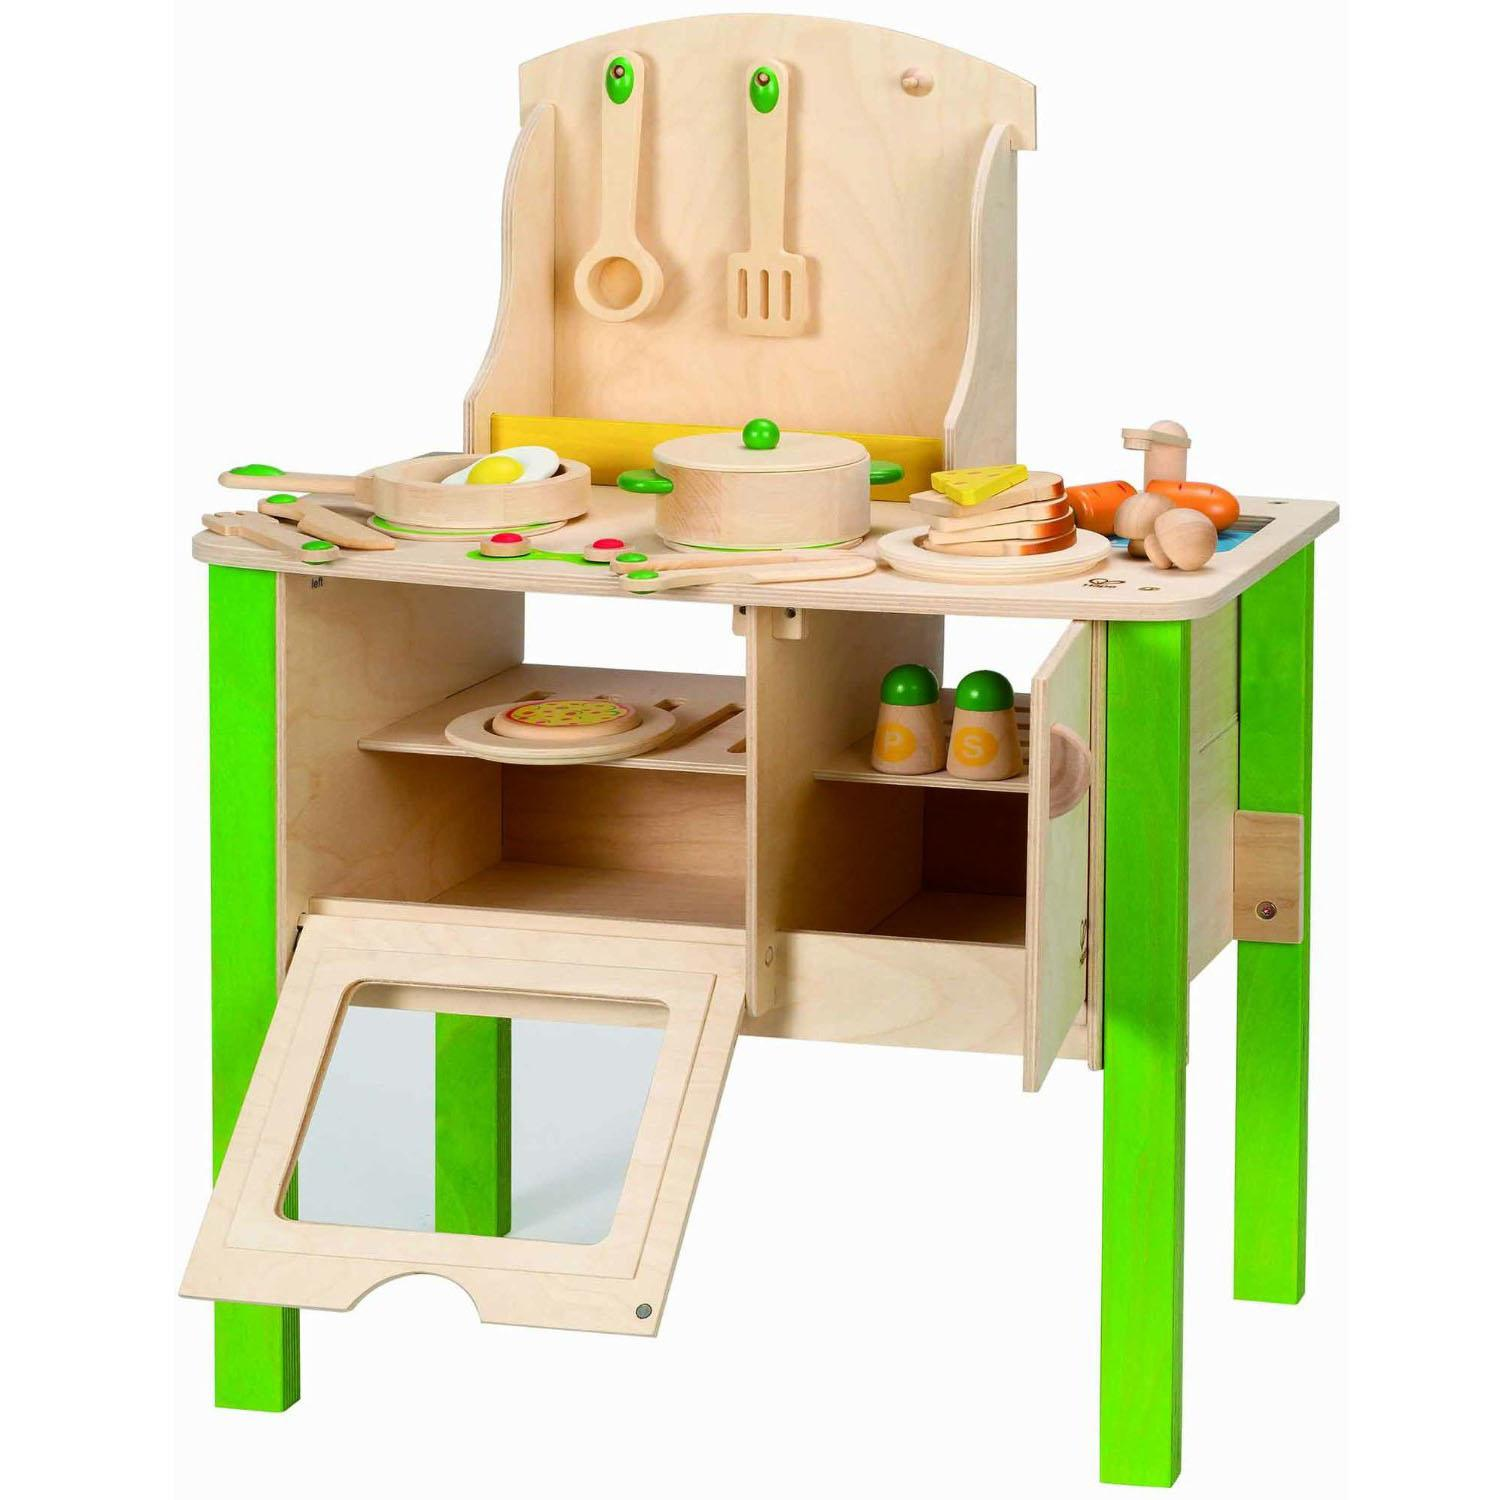 Hape kitchen